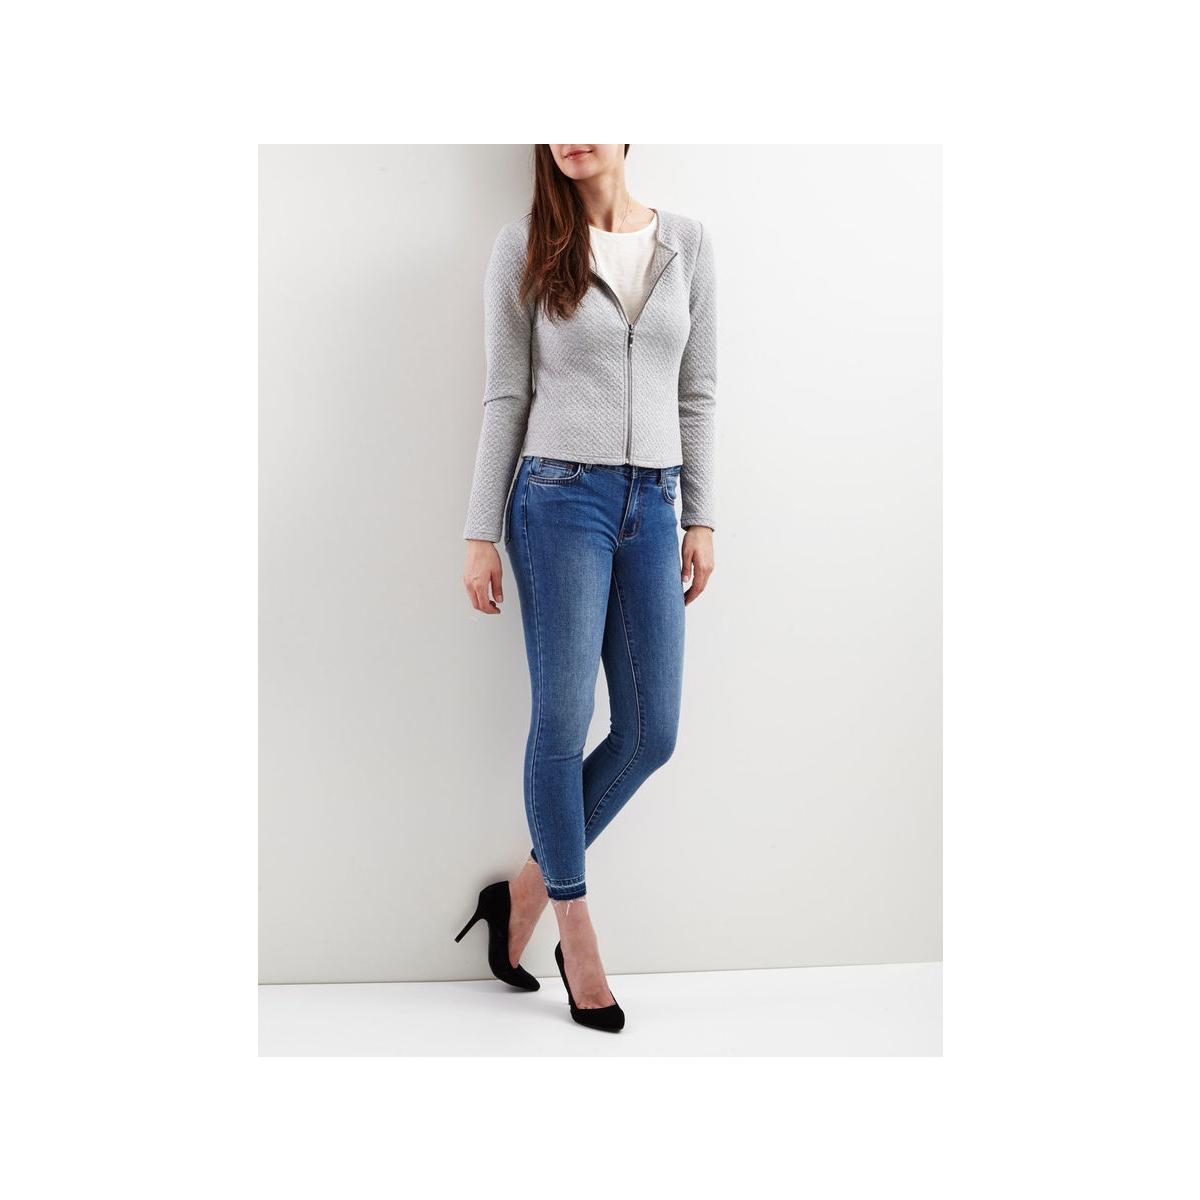 vinaja new short jacket 14032657-1 vila vest light grey melange